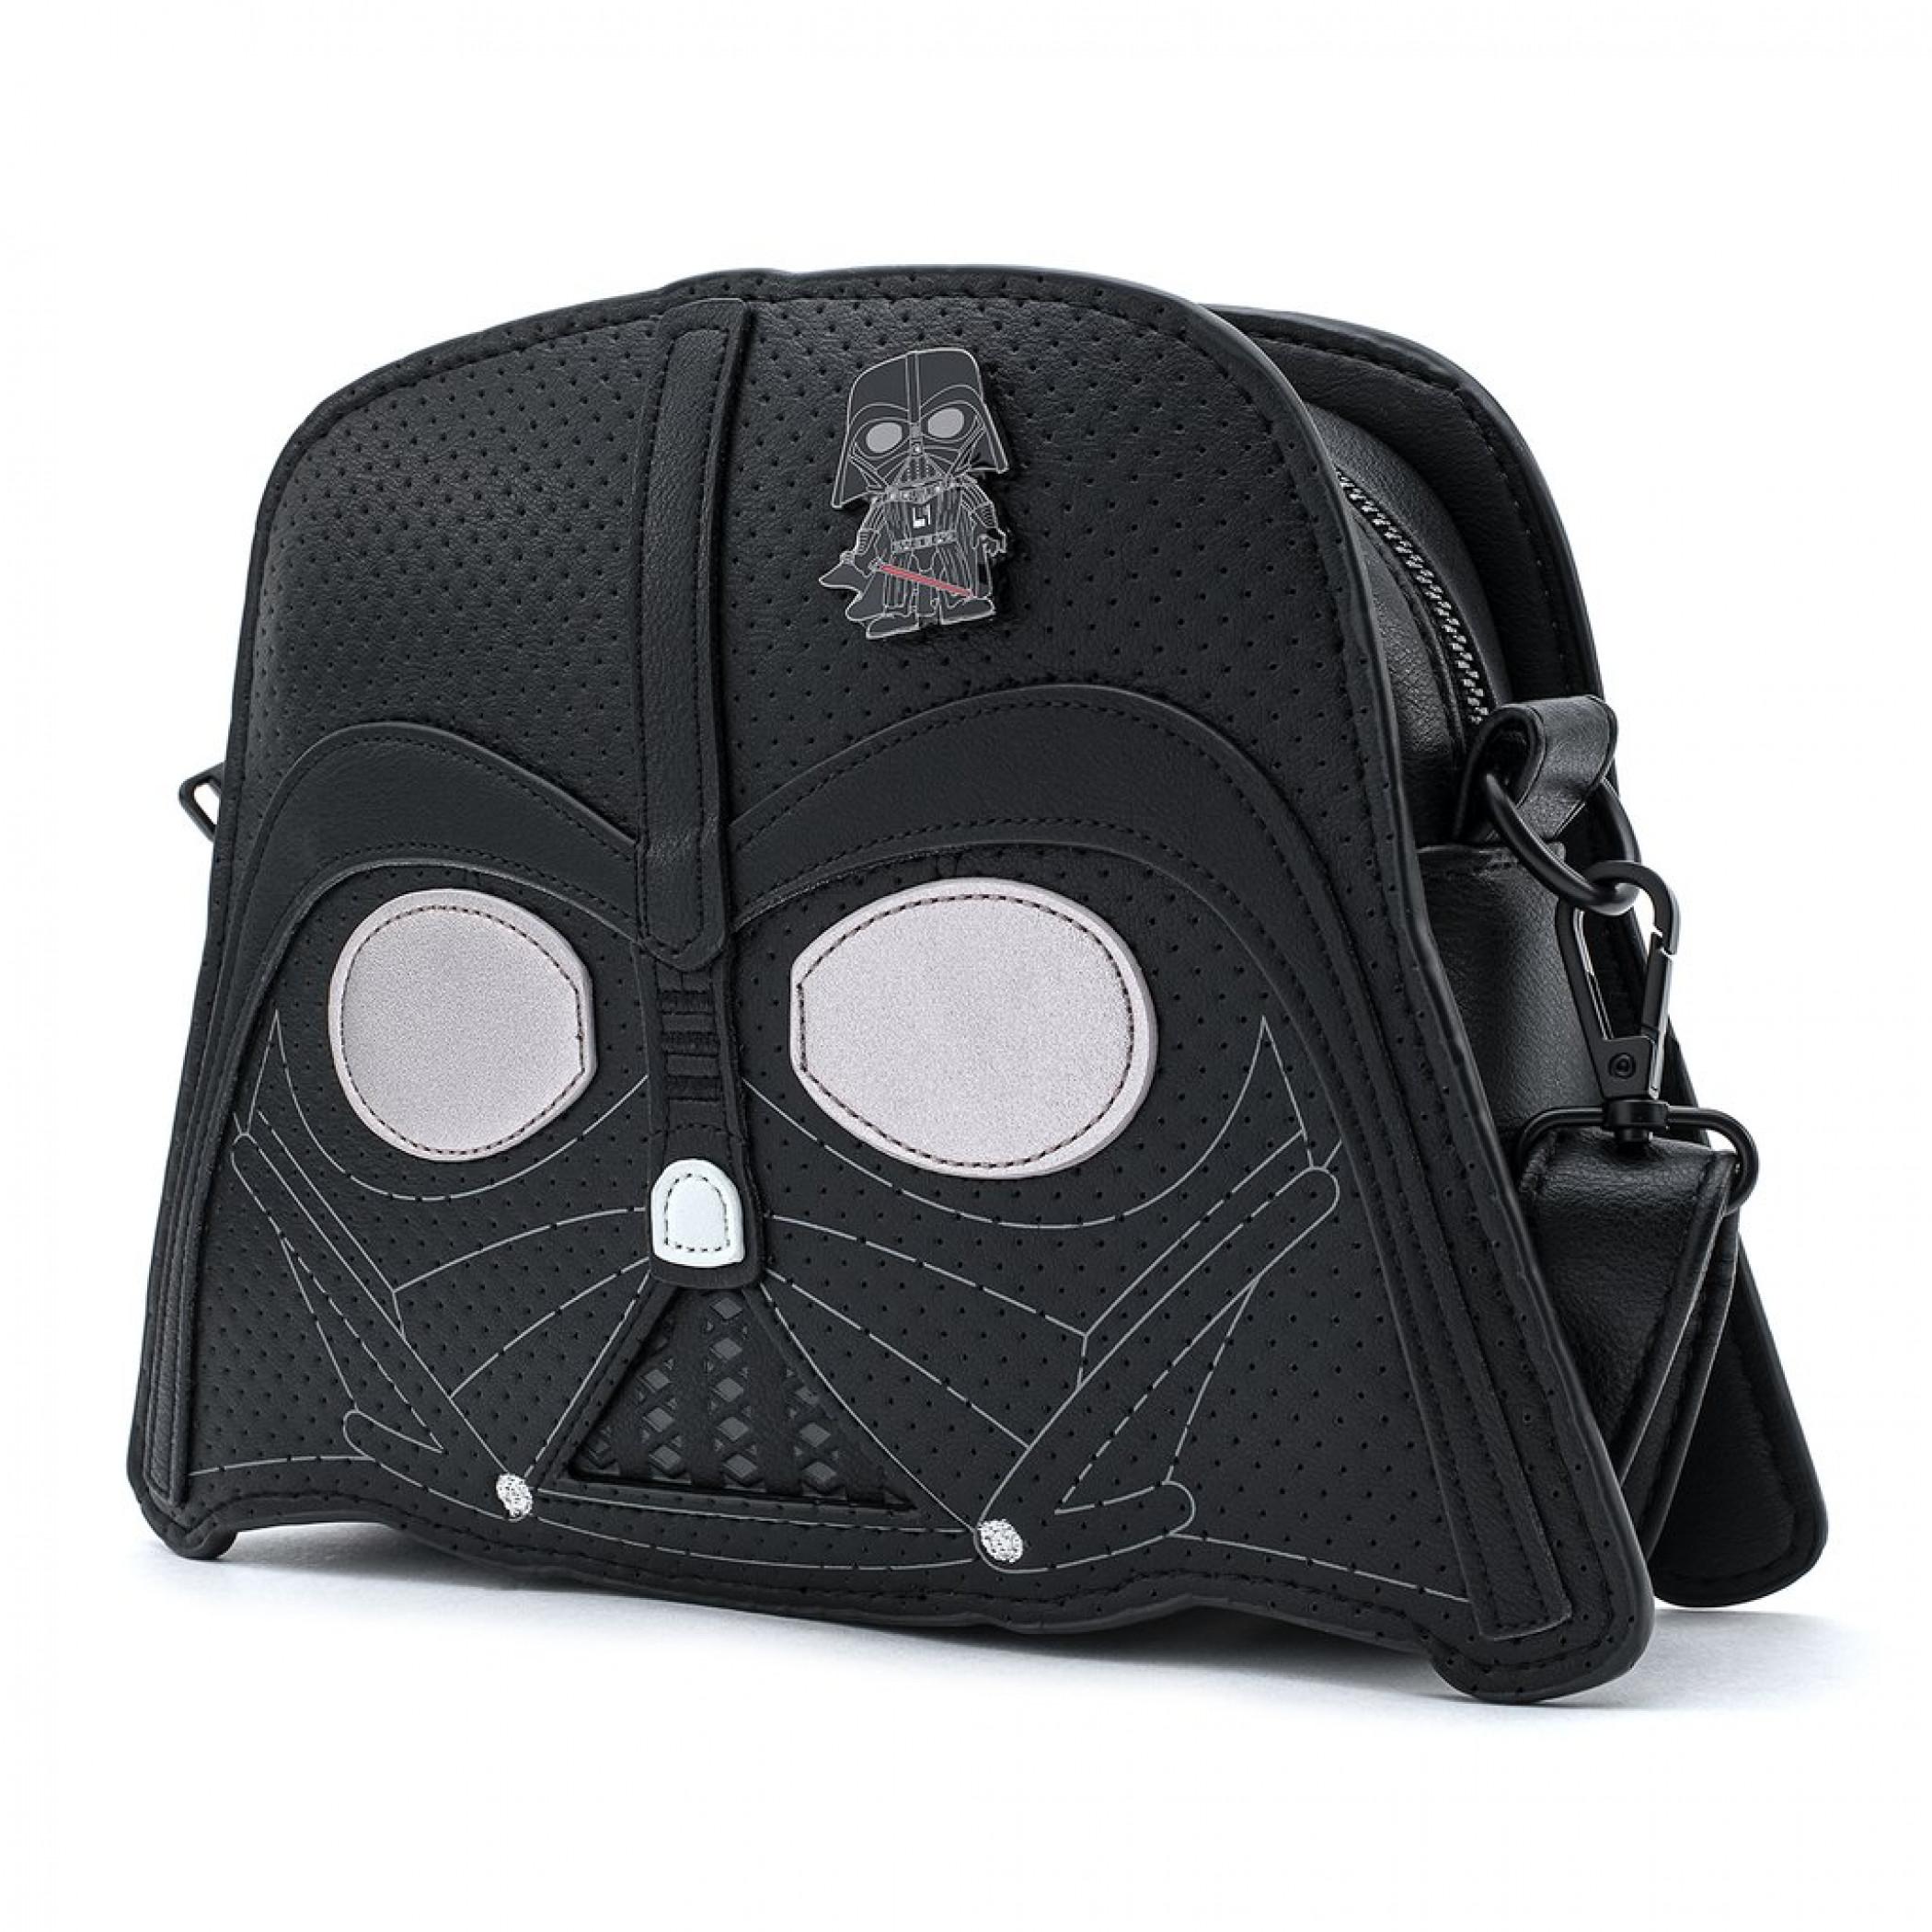 Star Wars Darth Vader Pop Pin Collector Crossbody Bag